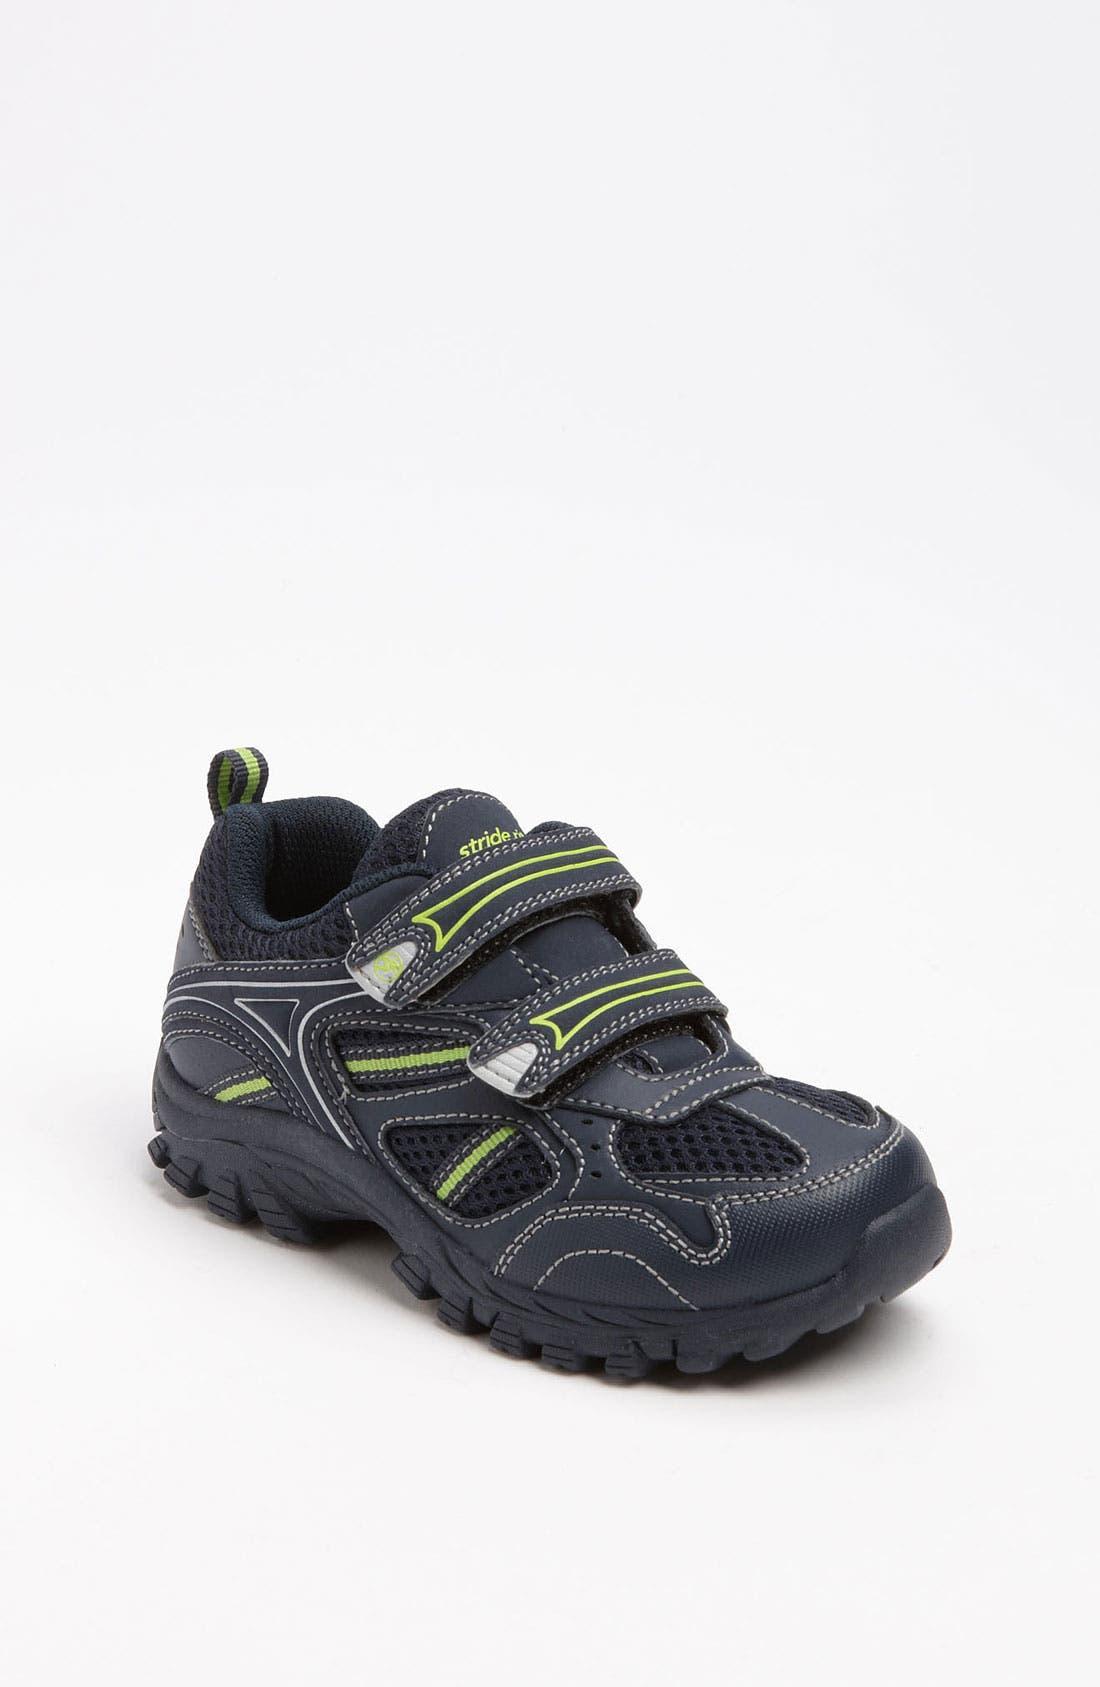 Alternate Image 1 Selected - Stride Rite 'Dallas' Sneaker (Baby, Walker, Toddler & Little Kid)